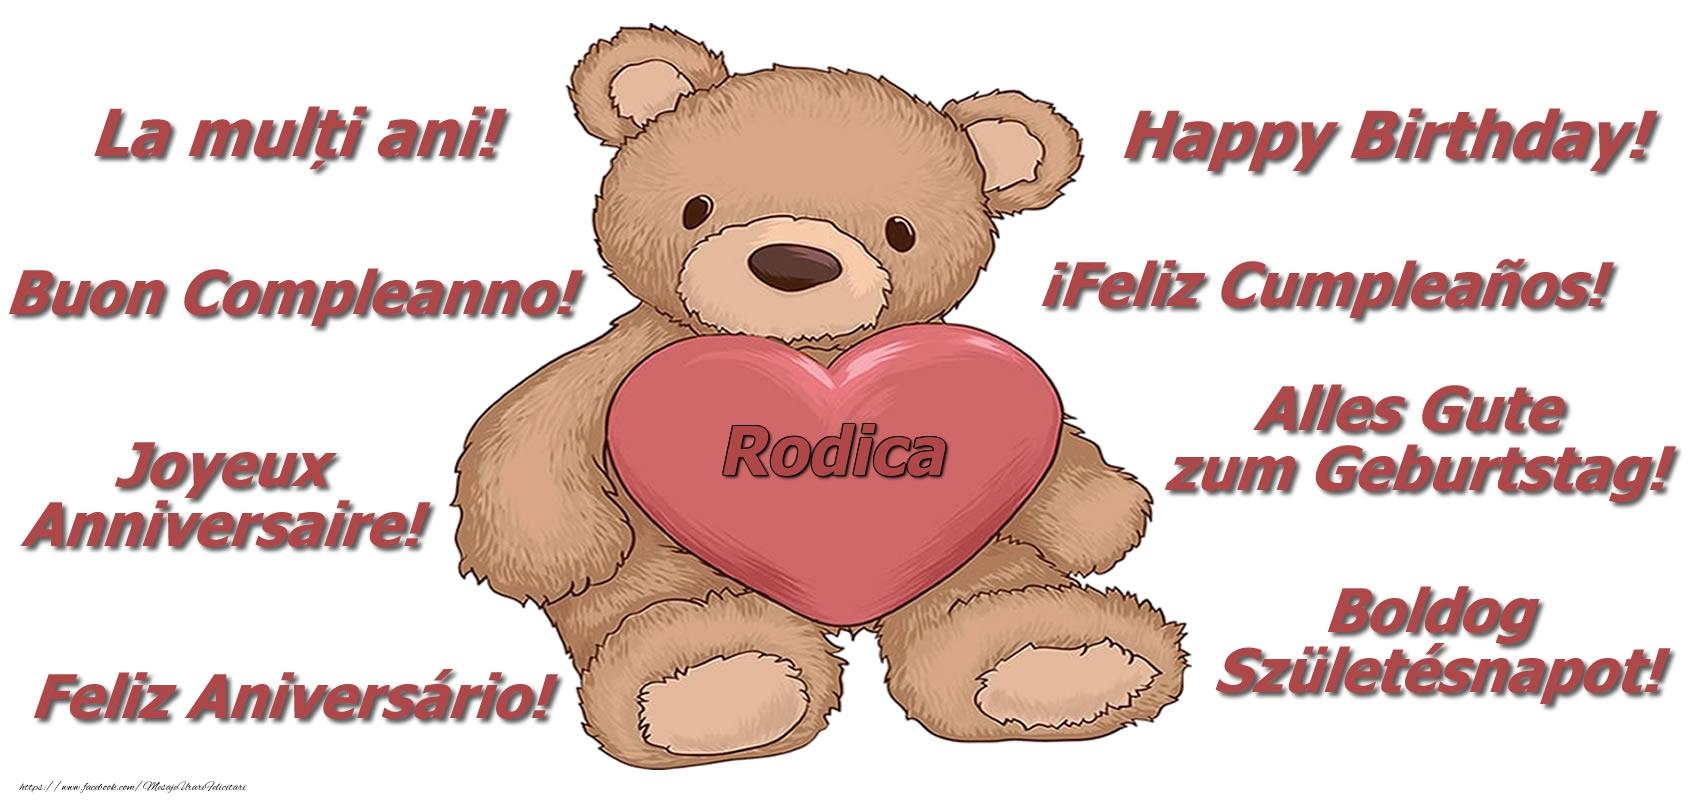 Felicitari de zi de nastere - La multi ani Rodica! - Ursulet